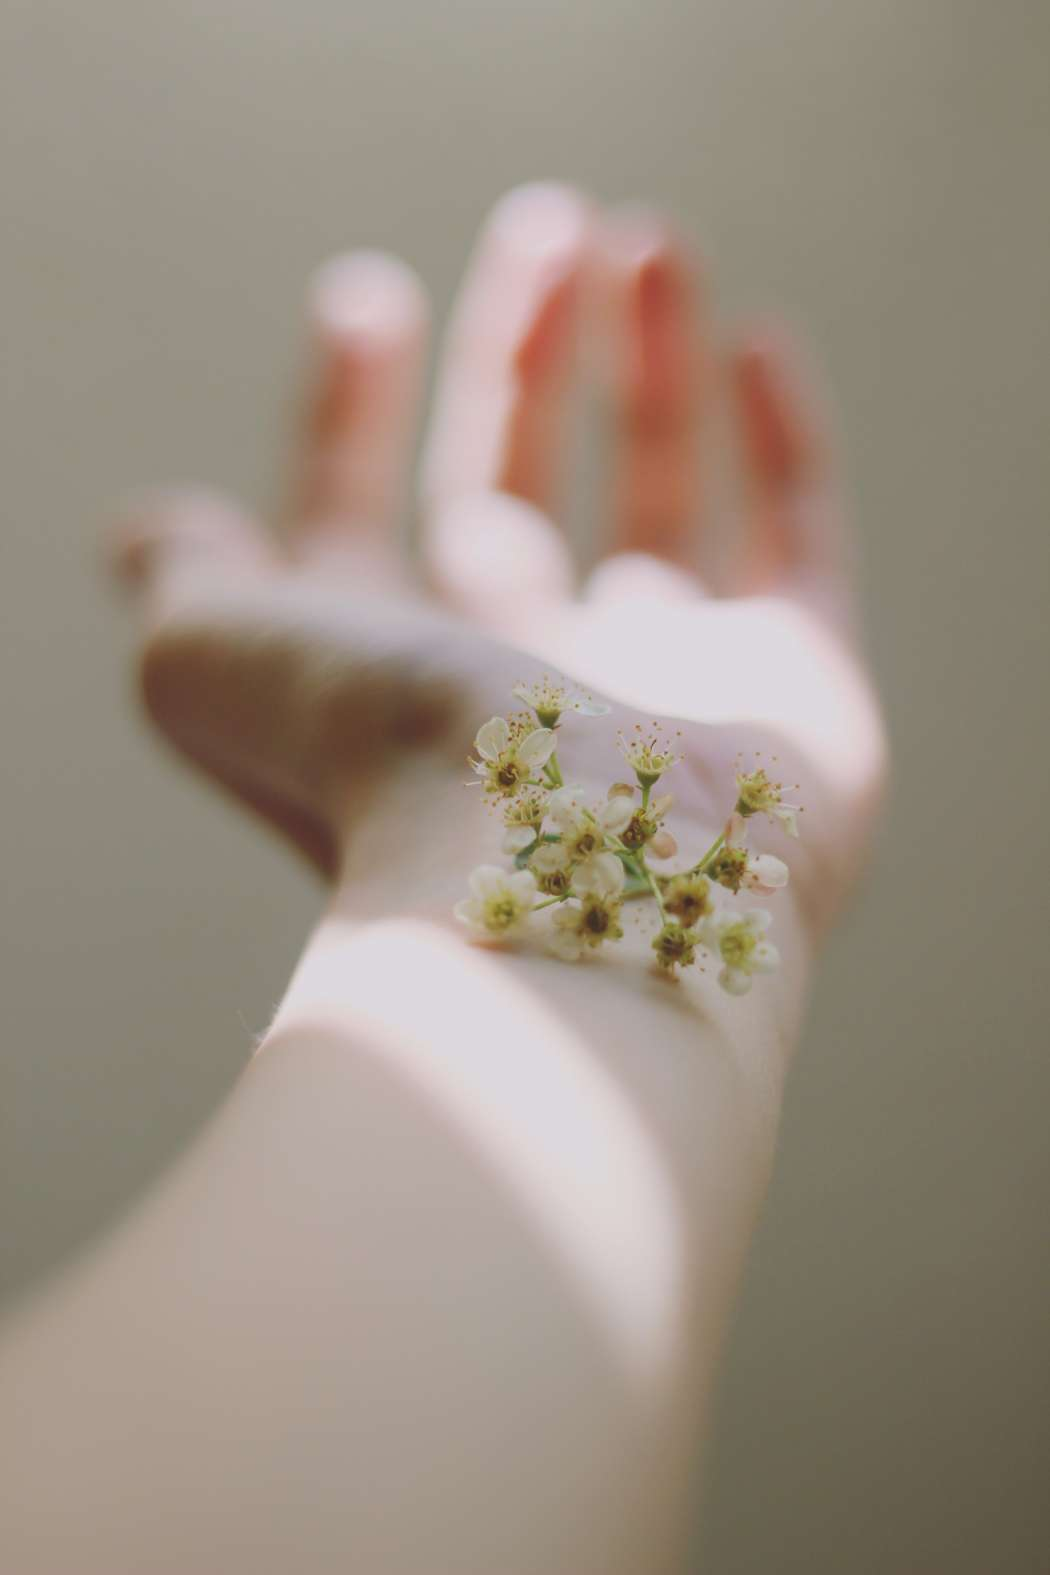 Plan de Belleza para la Postmenopausia